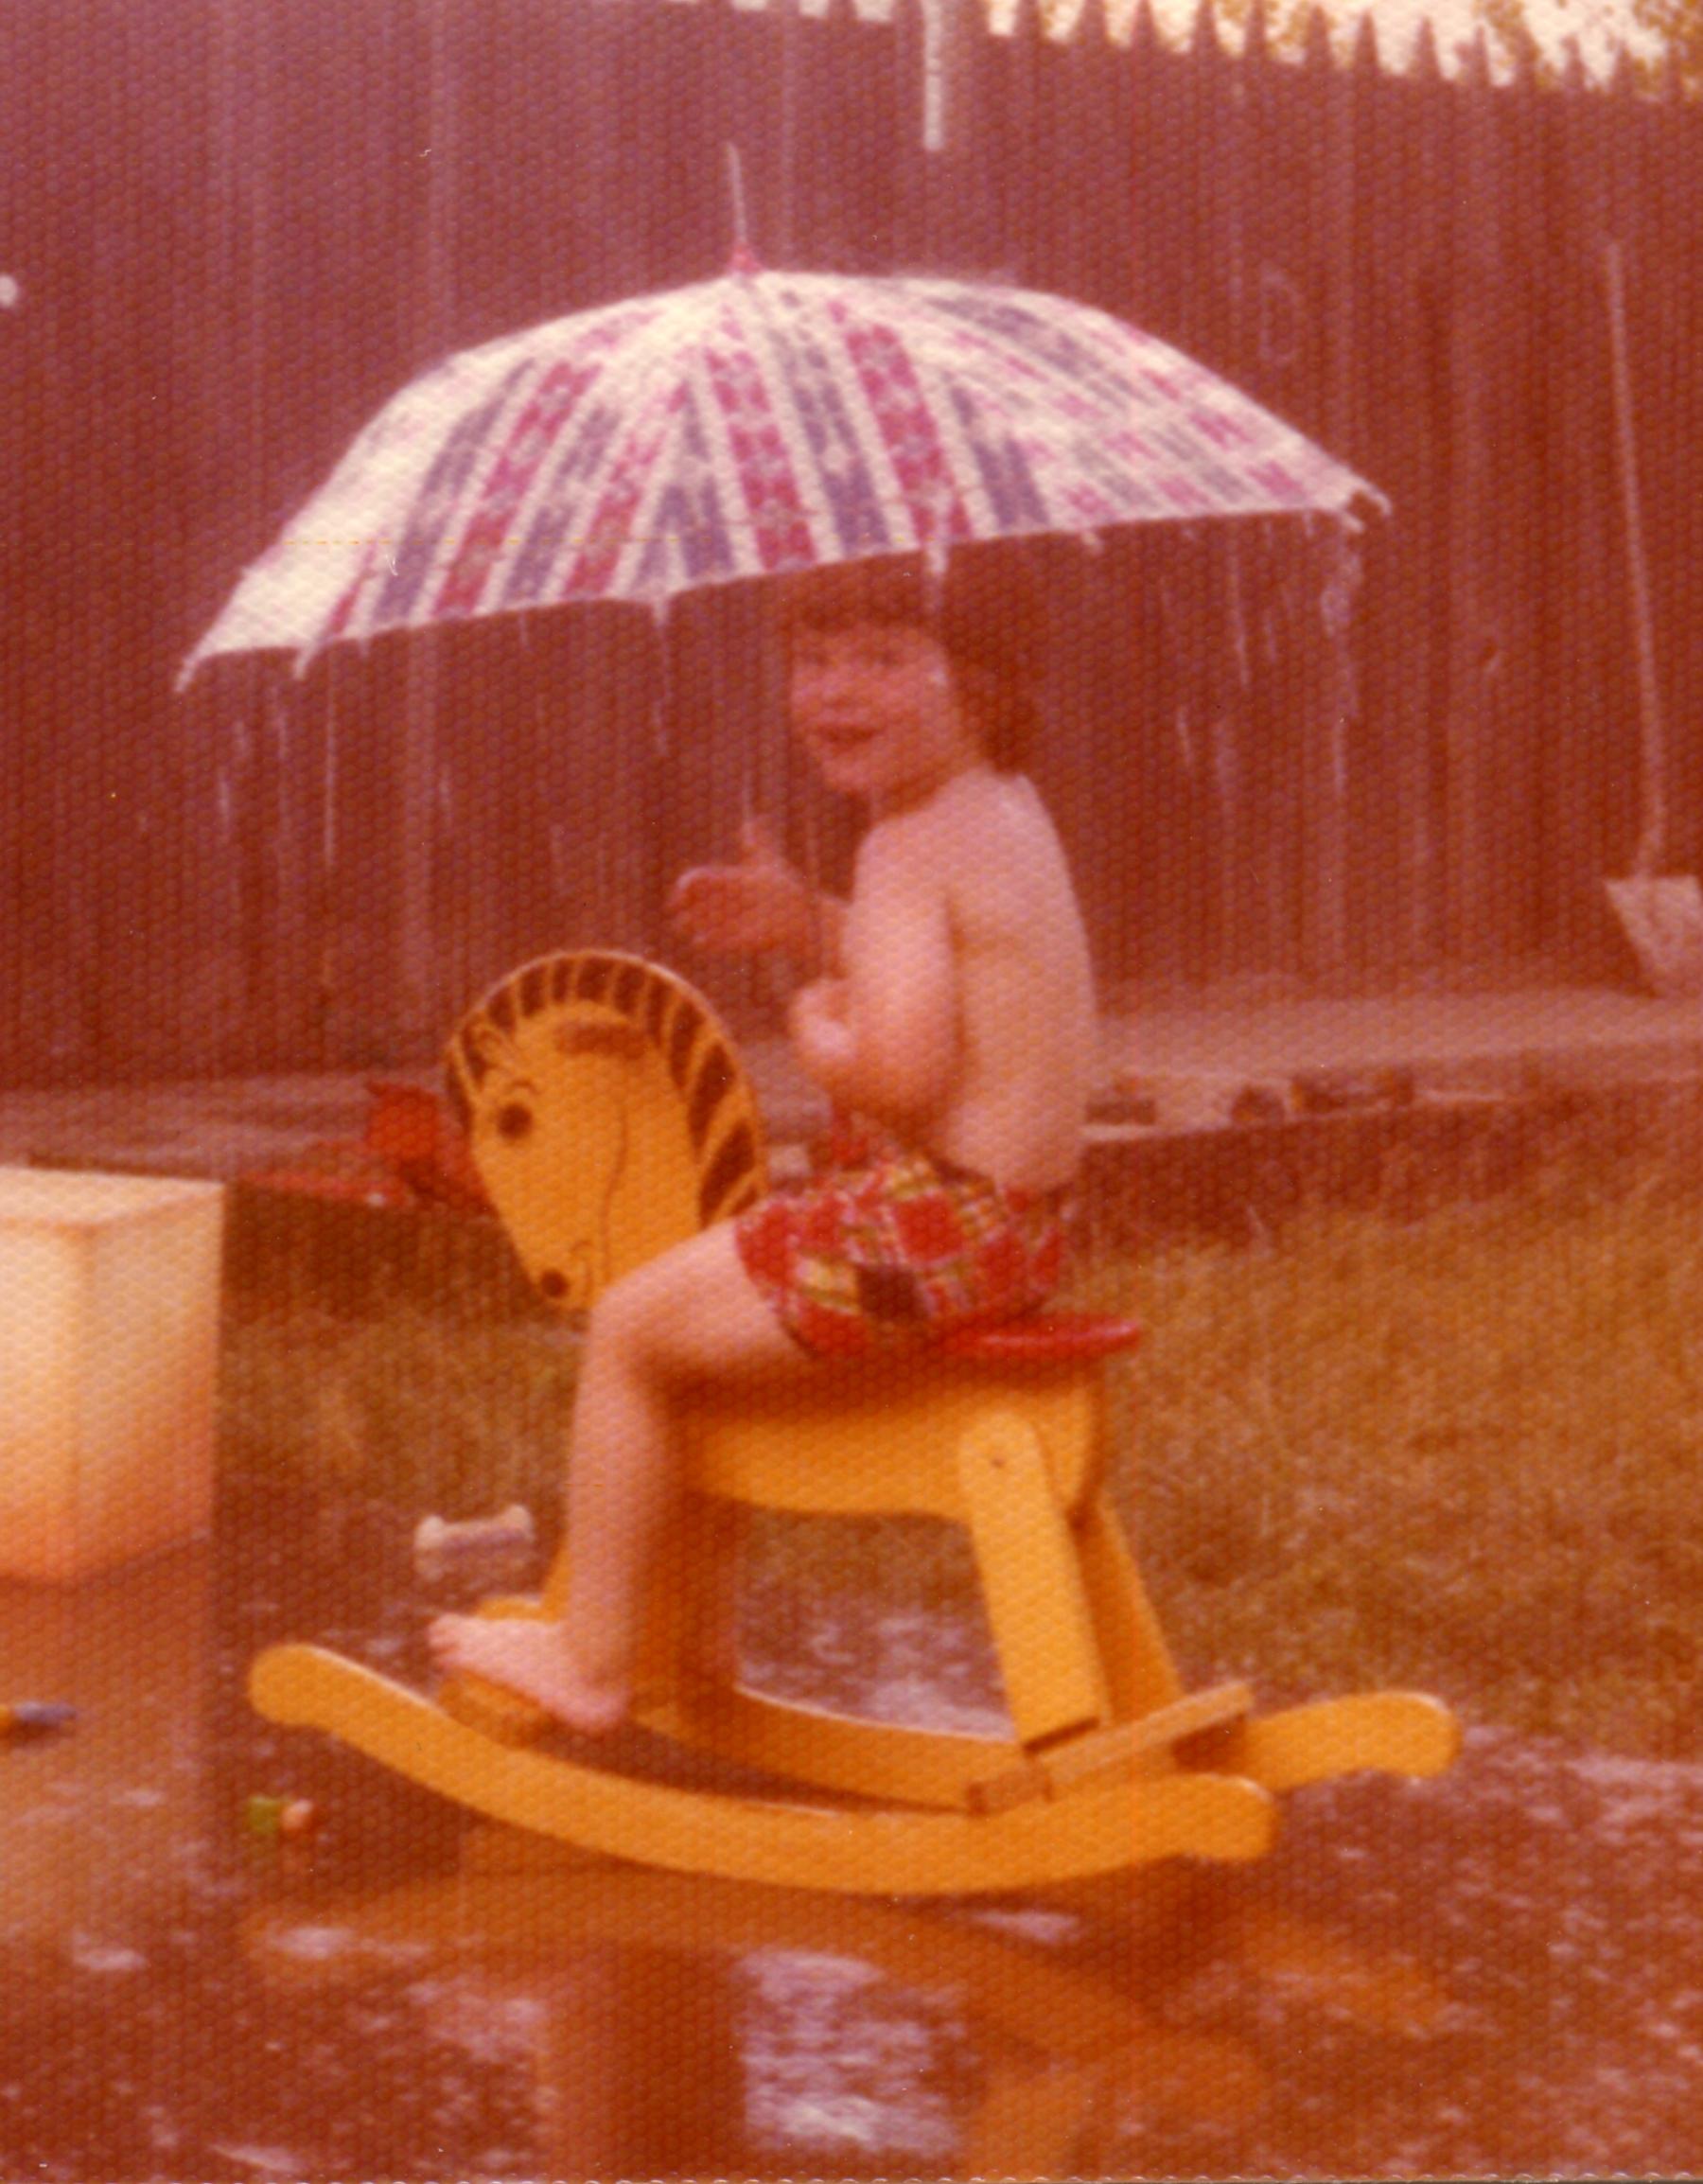 Jesse Waugh at Elm Street in Richmond, California in 1978